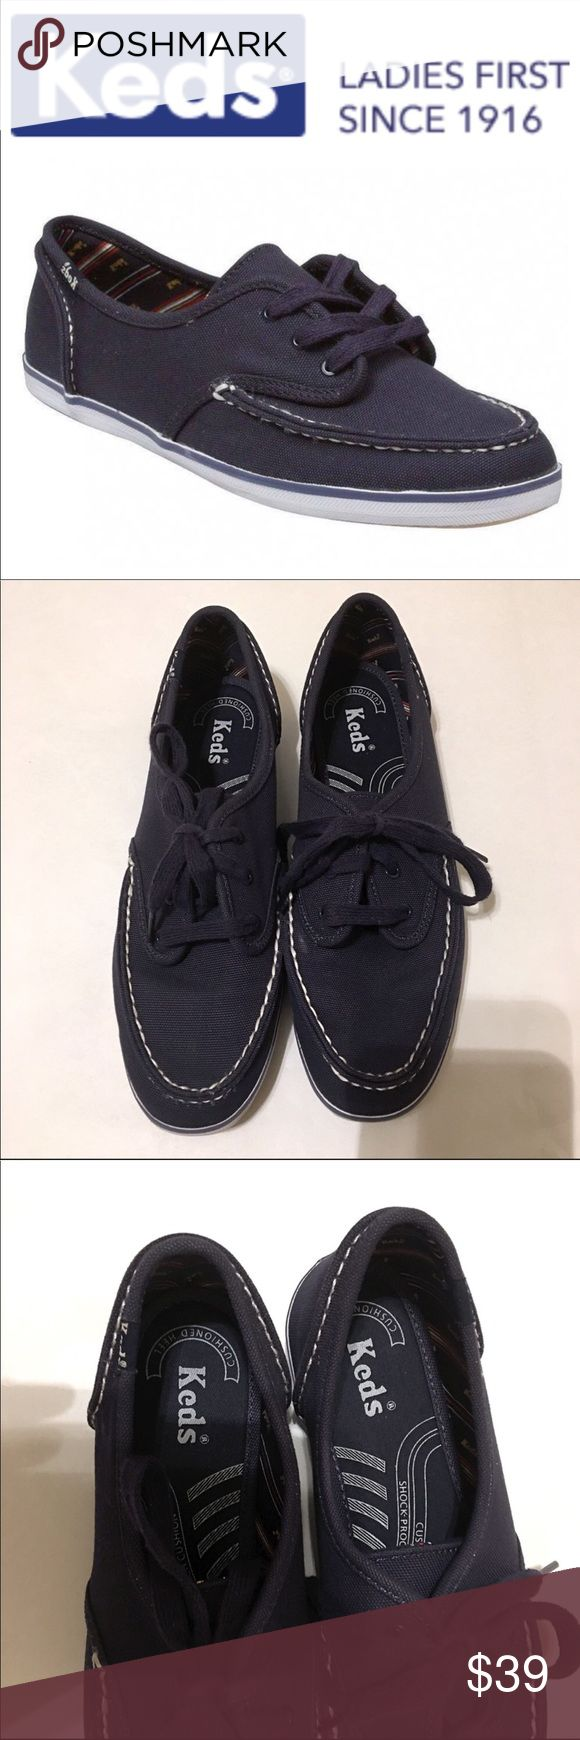 ✨Keds Champion Skipper Flats ♦️Keds Champion Skipper Flats Keds Shoes Sneakers